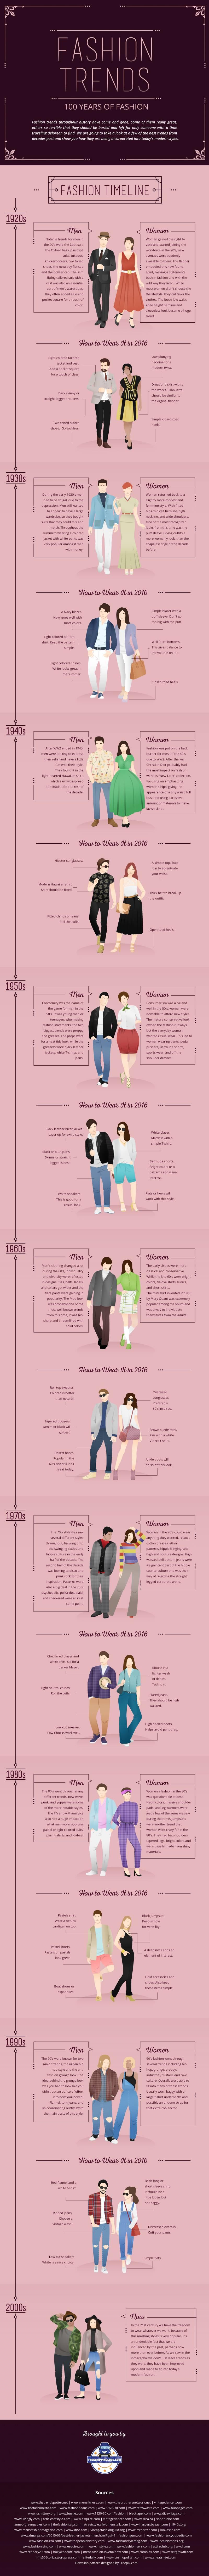 100 años moda  adaptarla estilo moderno infografía